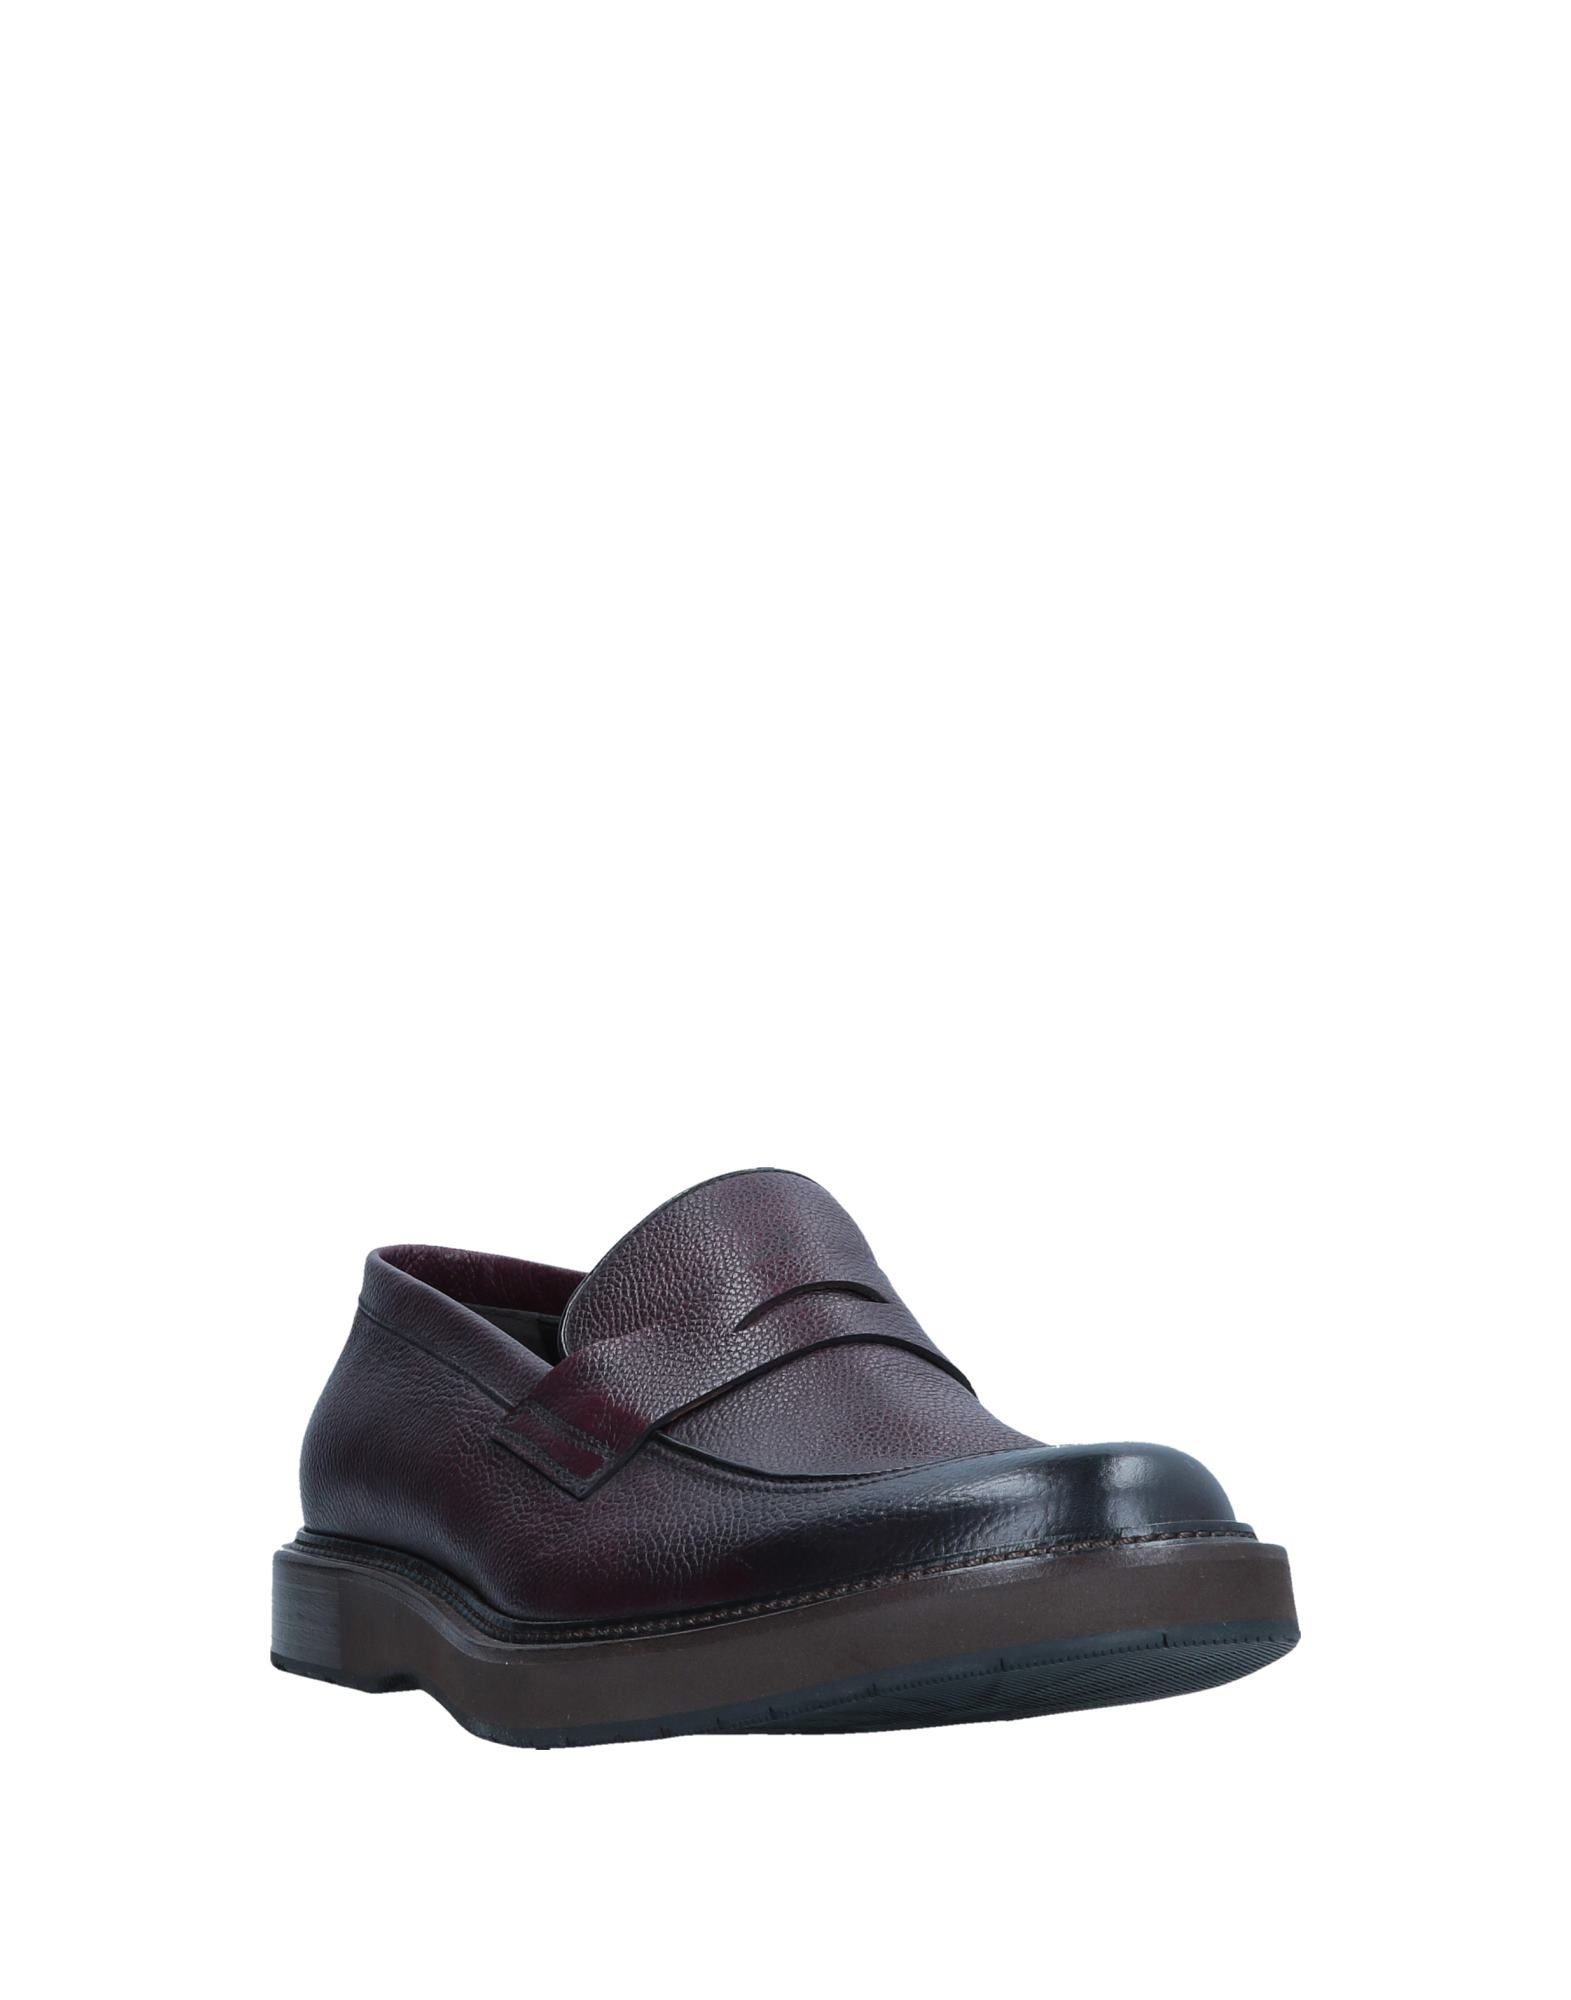 Blu|Barrett  By Barrett Mokassins Herren  Blu|Barrett 11549320XW Gute Qualität beliebte Schuhe c19ff4